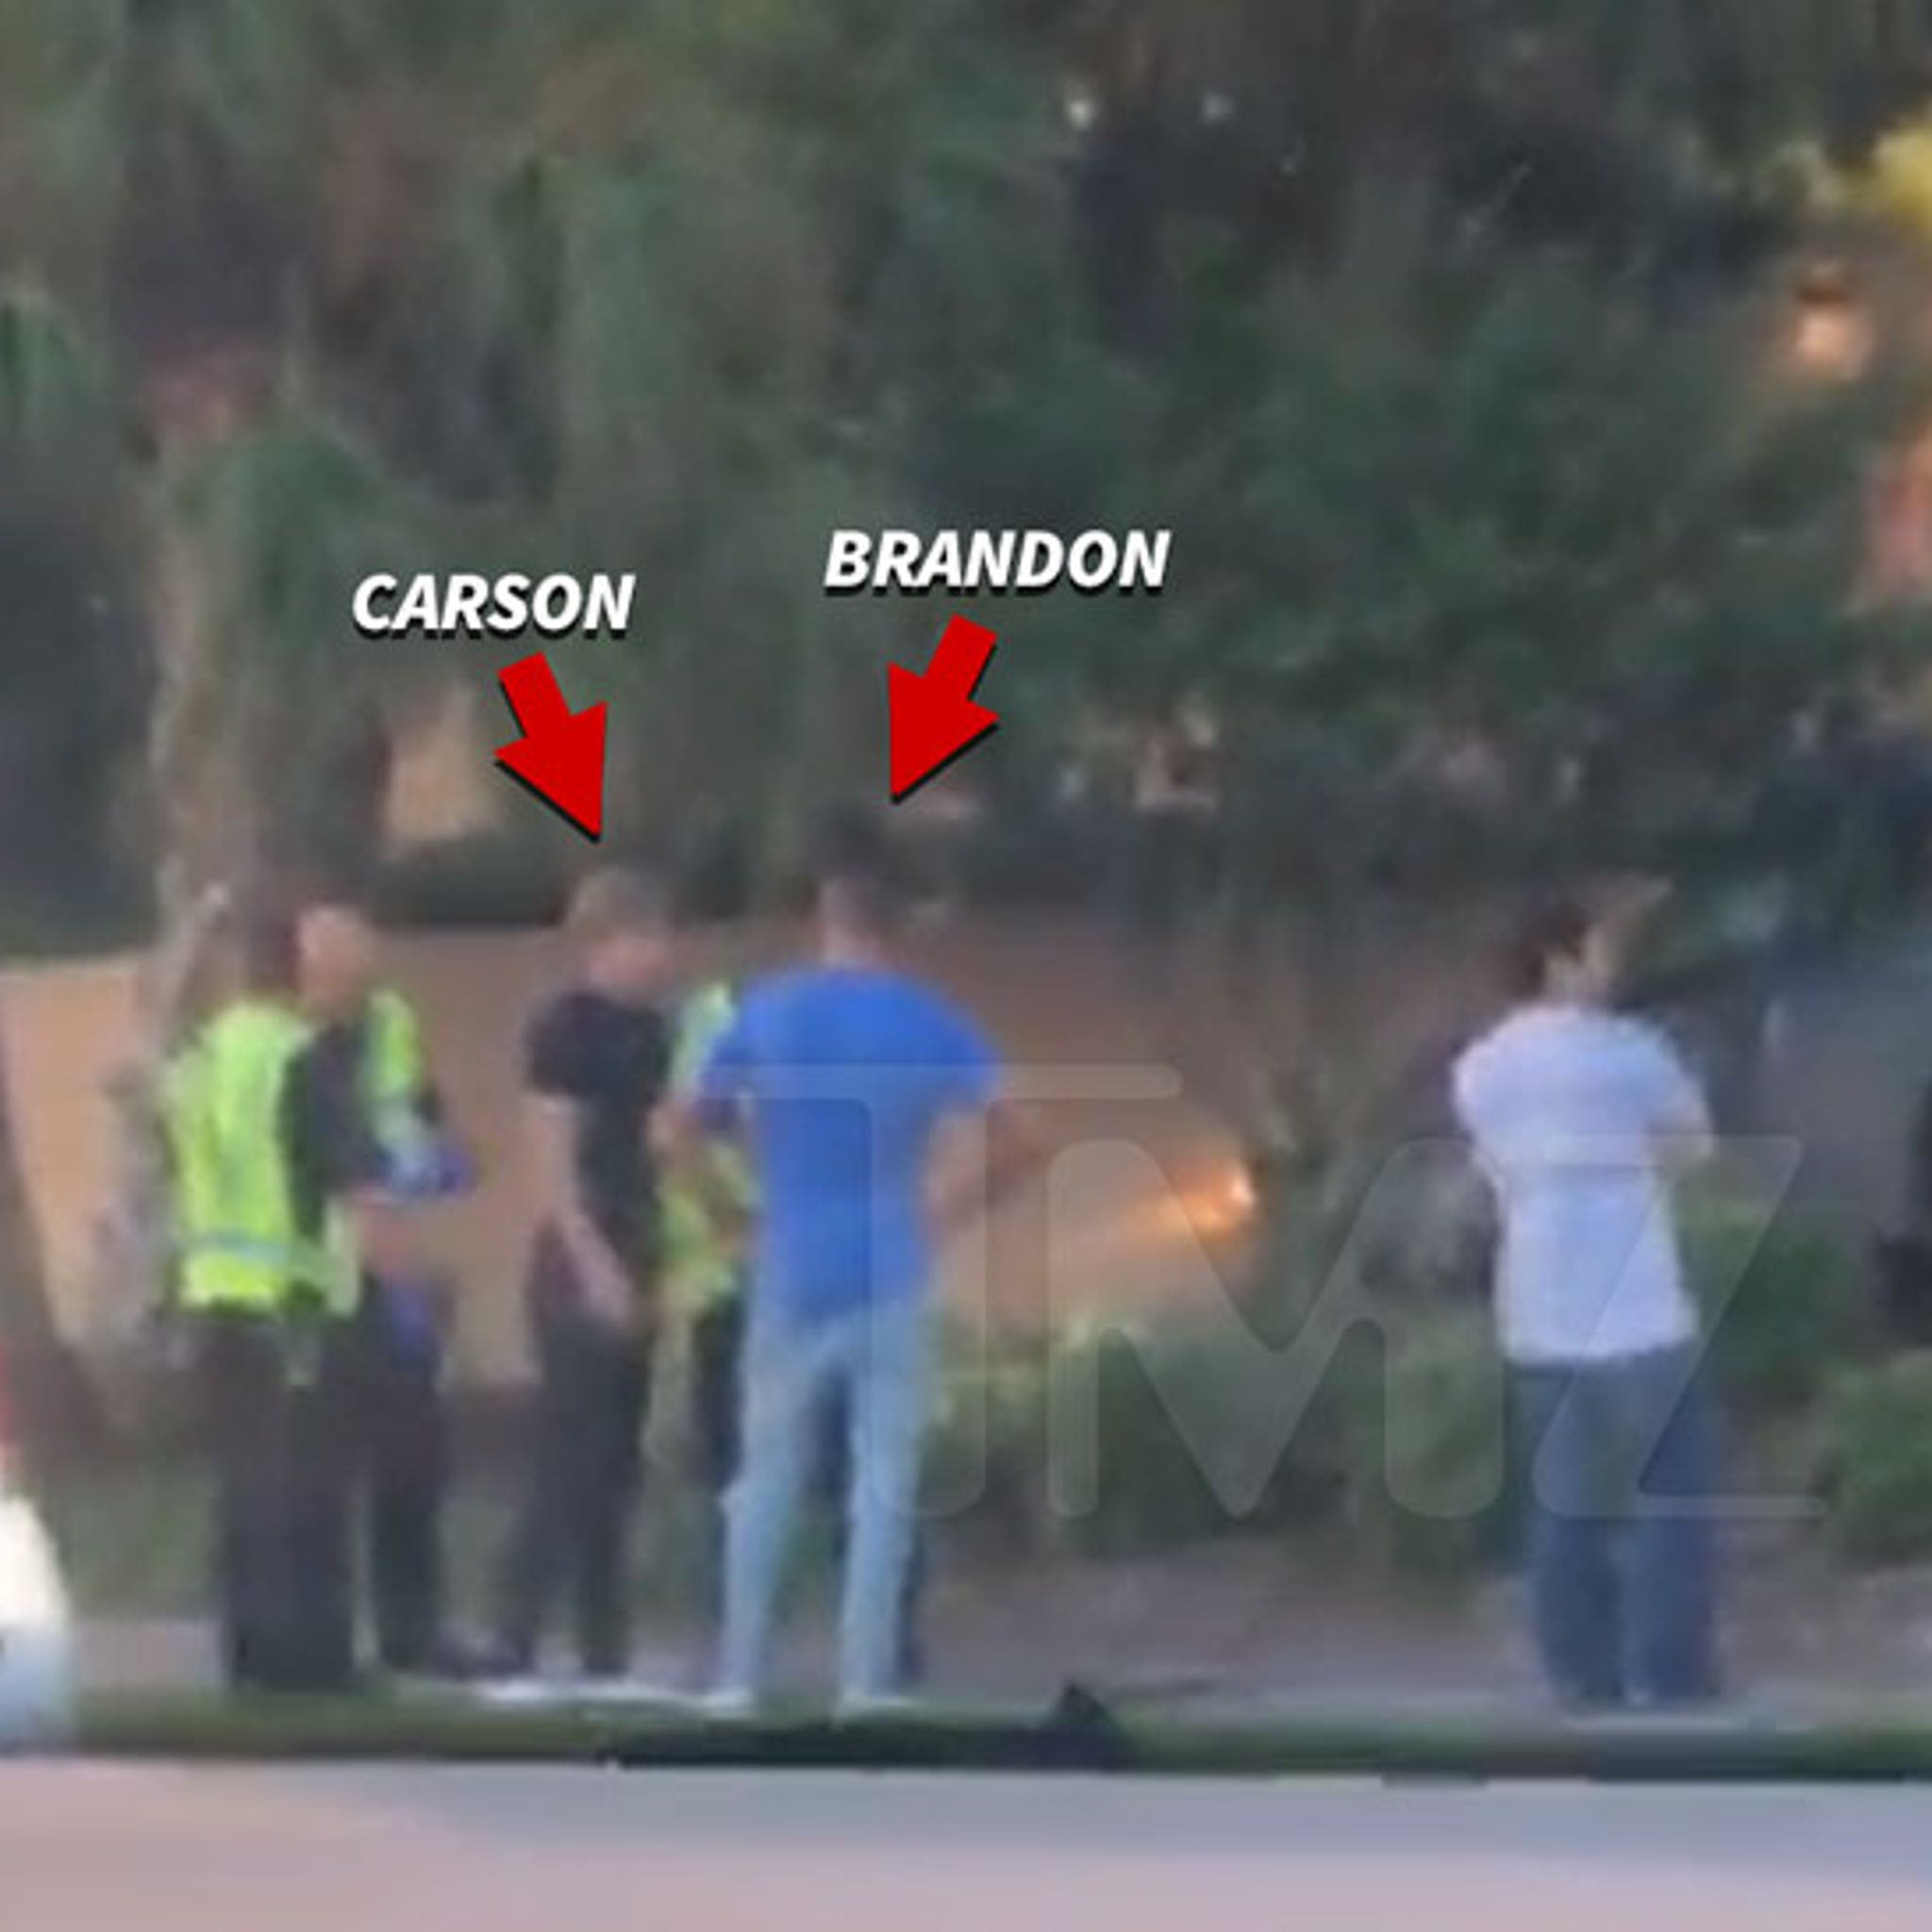 Siesta Key' Star Brandon Gomes in Violent 3-Car Crash